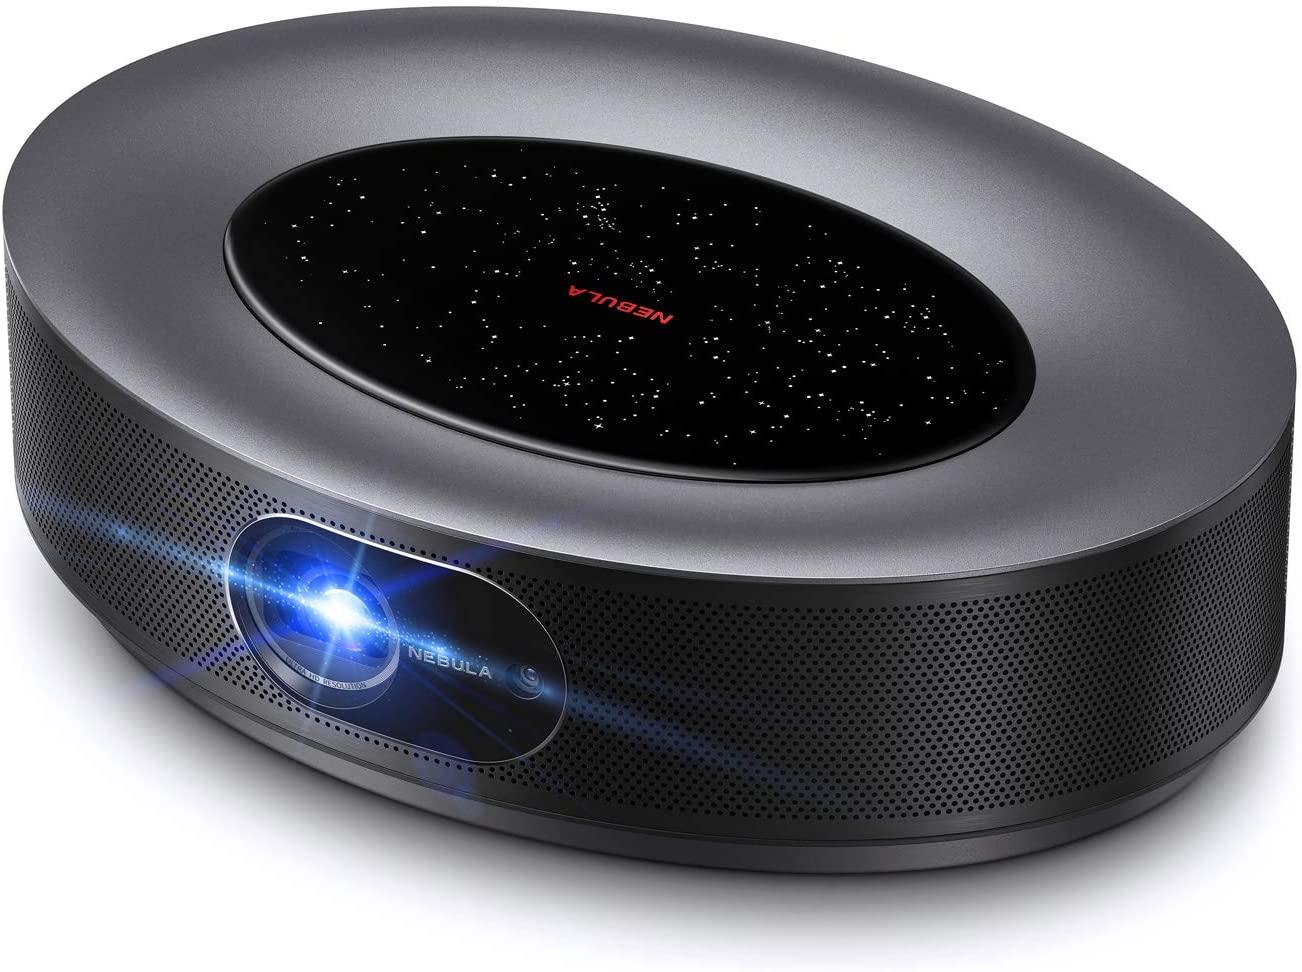 Vidéoprojecteur Anker Nebula Cosmos Max - 4K (Vendeur tiers - via coupon)